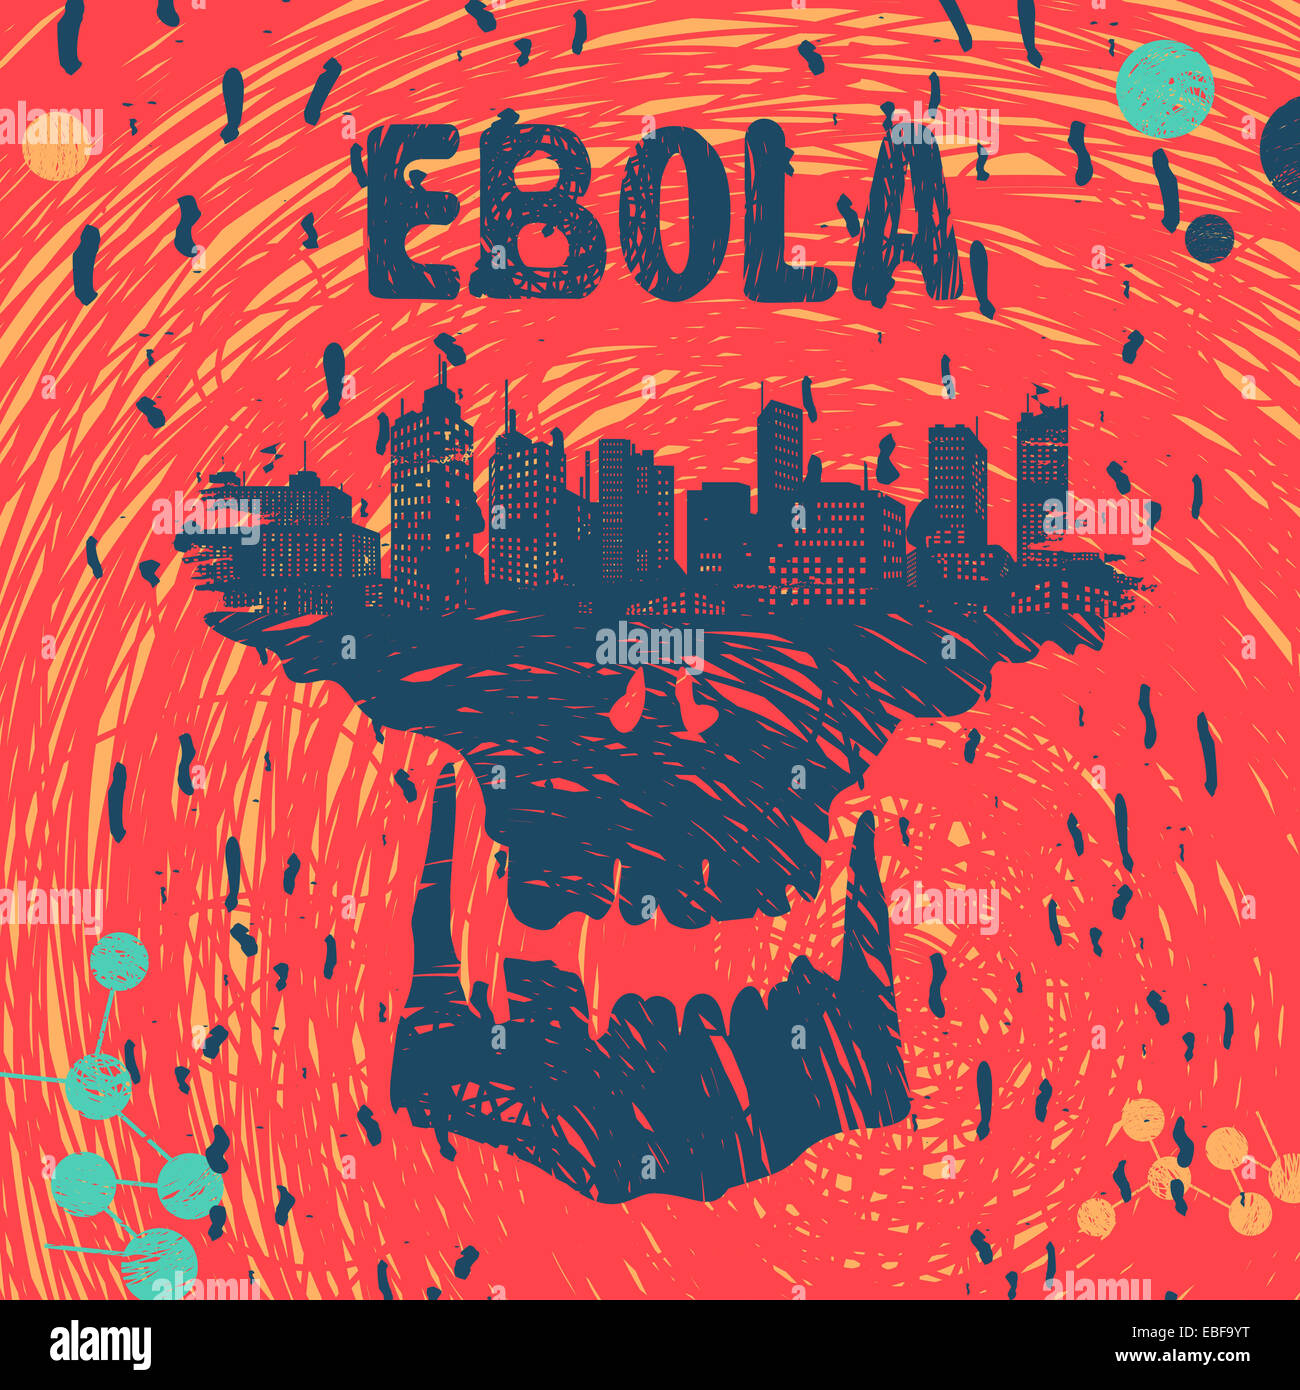 Ebola-Virus Symbol Dateiformat Eps 8 Stockbild